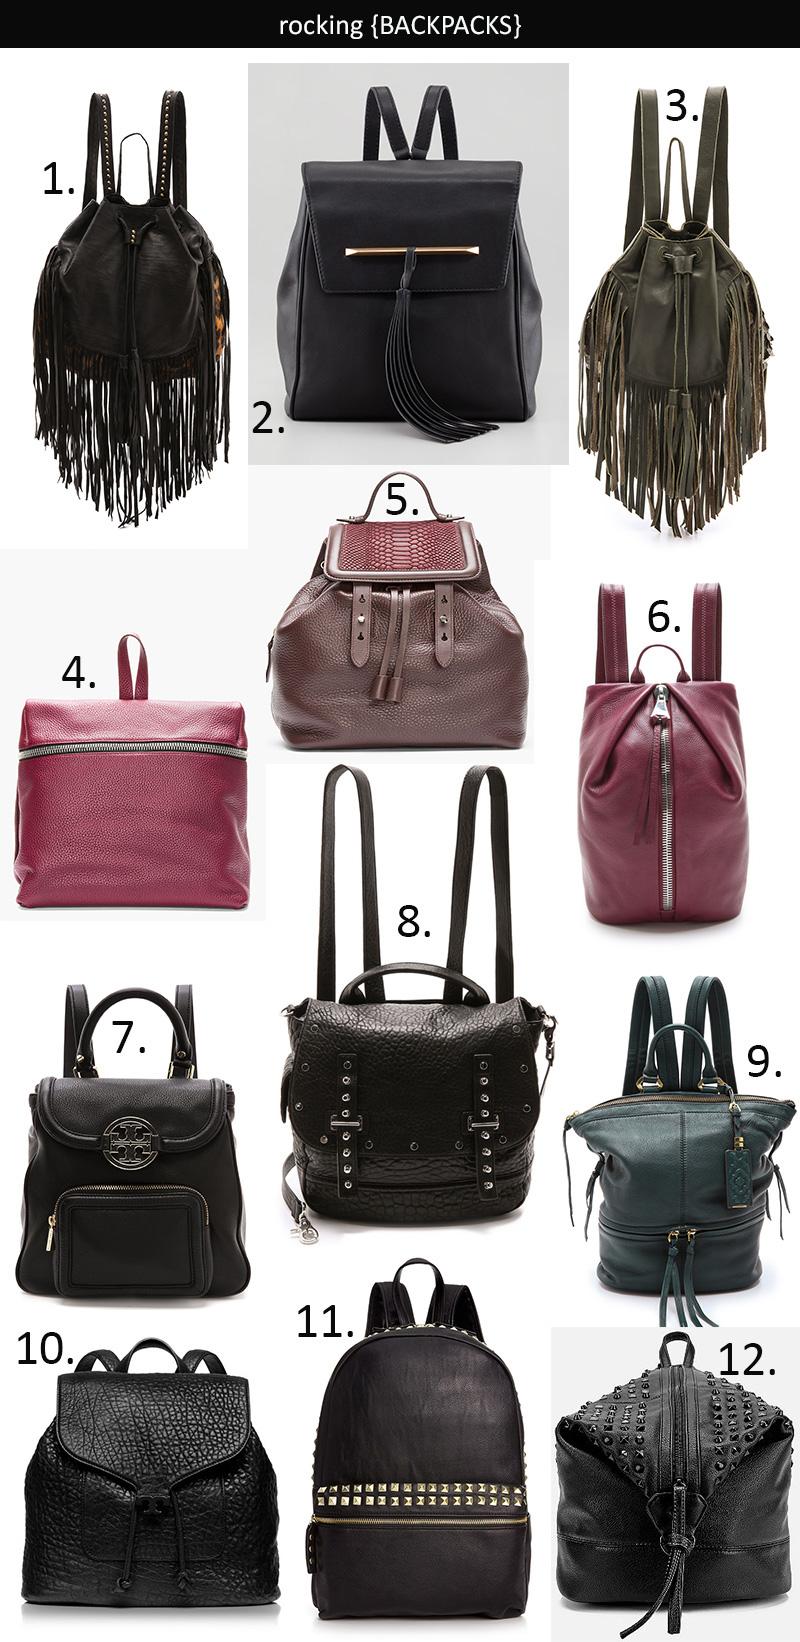 roundup_backpacks